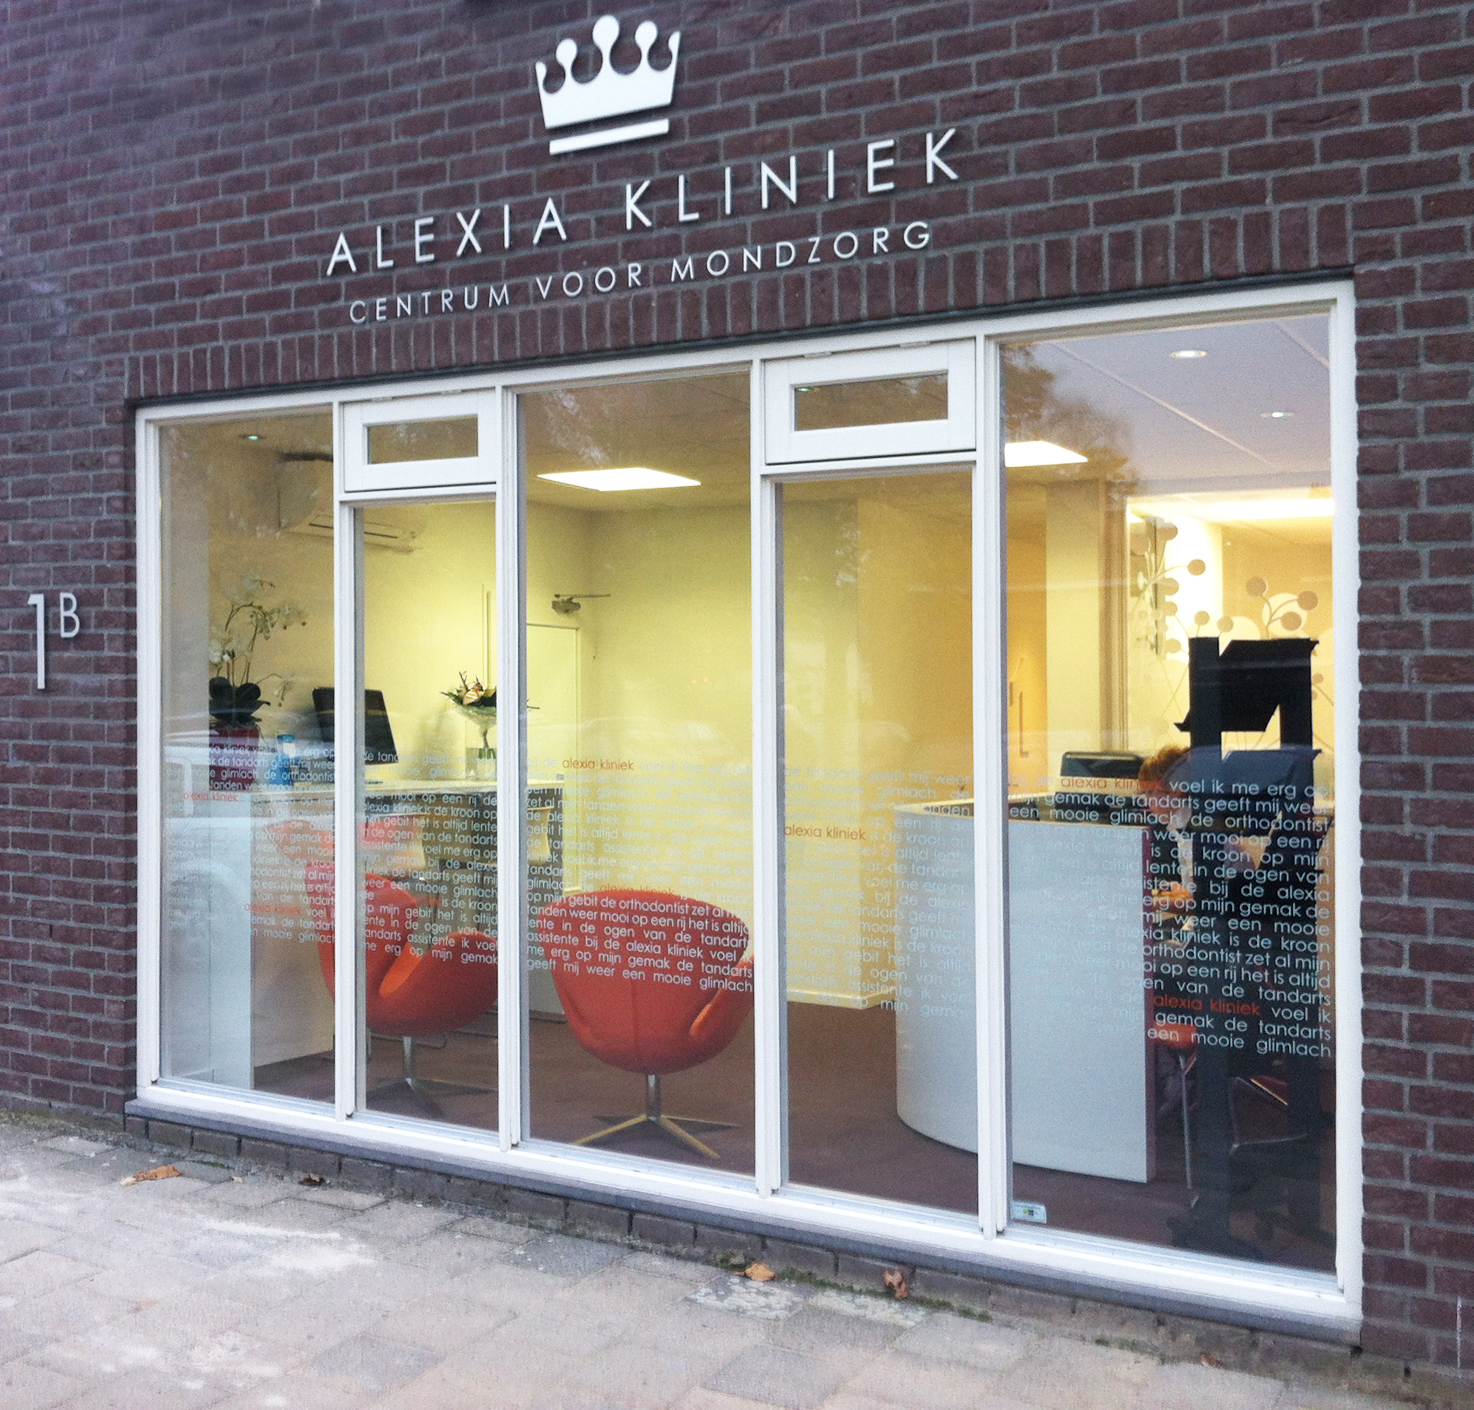 Thuiskantoor En Aktieboek Roermond  Hippe slaapkamer lamp images about kinderkamerstyling on new